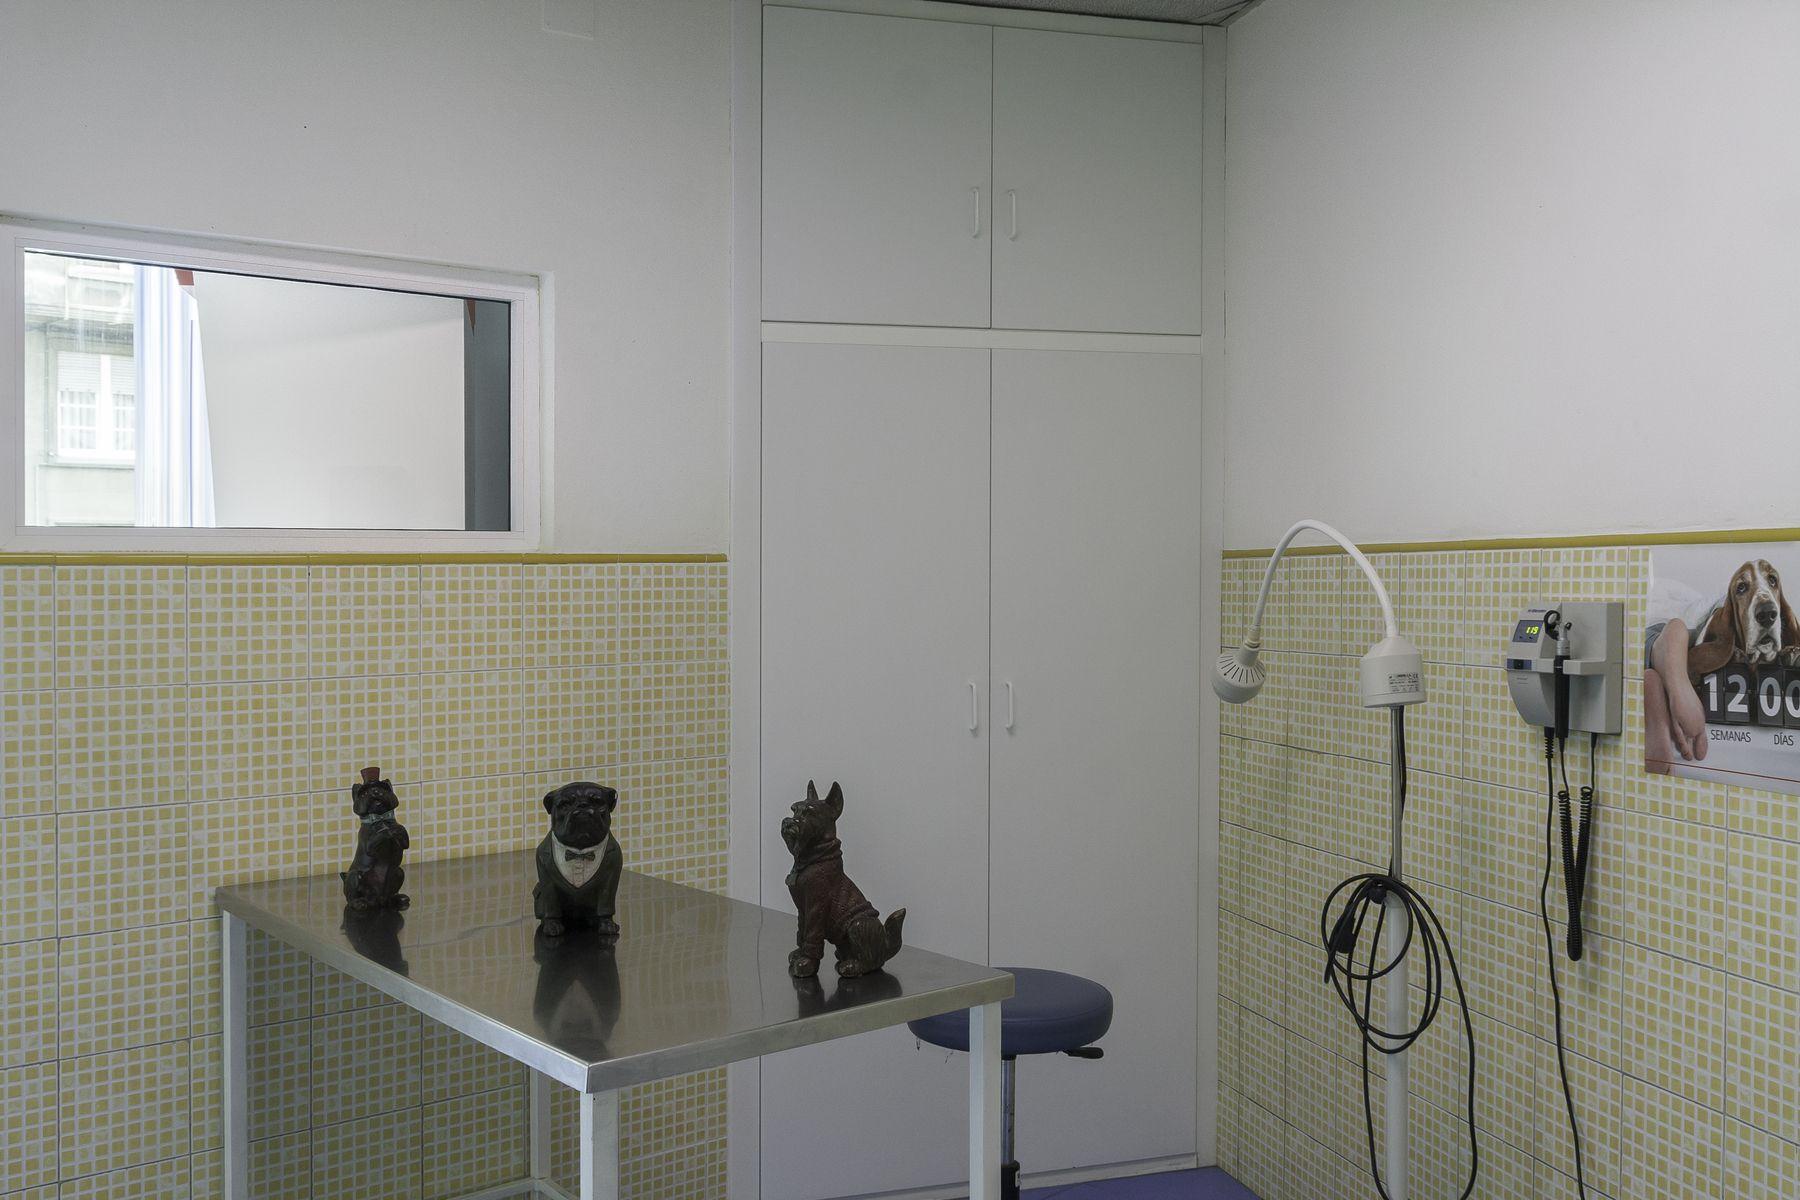 Hospitalización veterinaria en Avilés